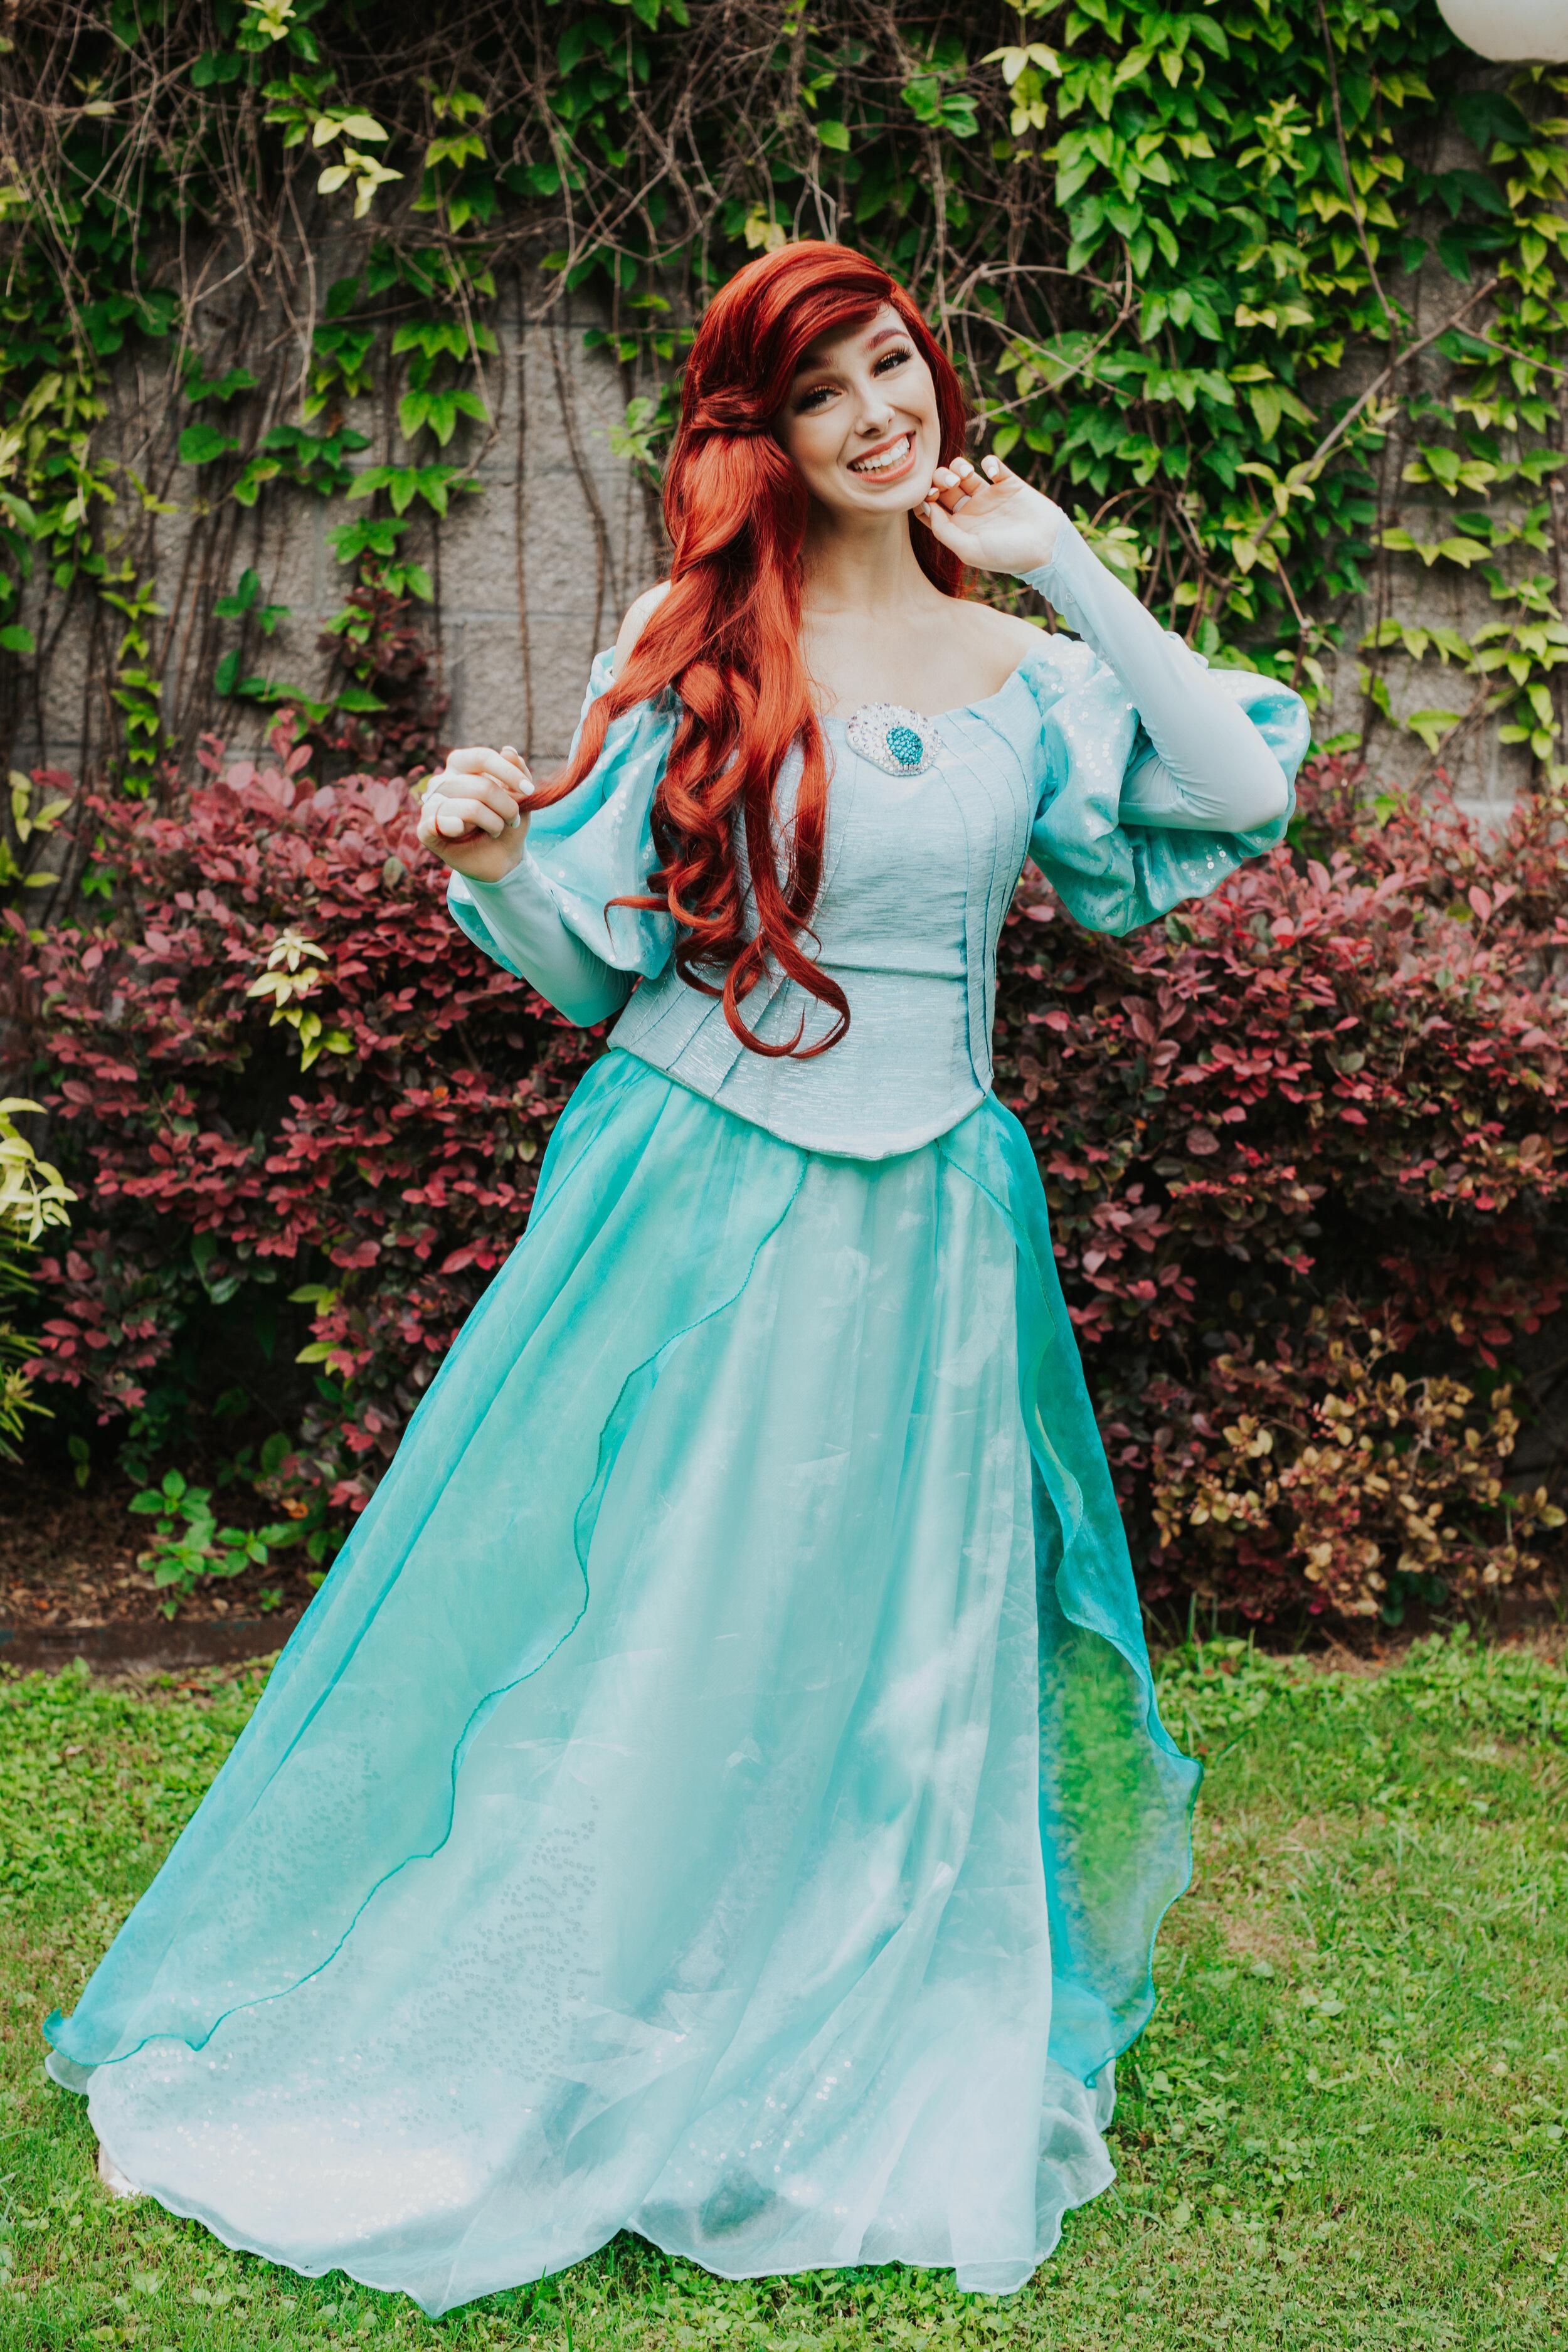 Mermaid Princess (Dress)  Entertainment